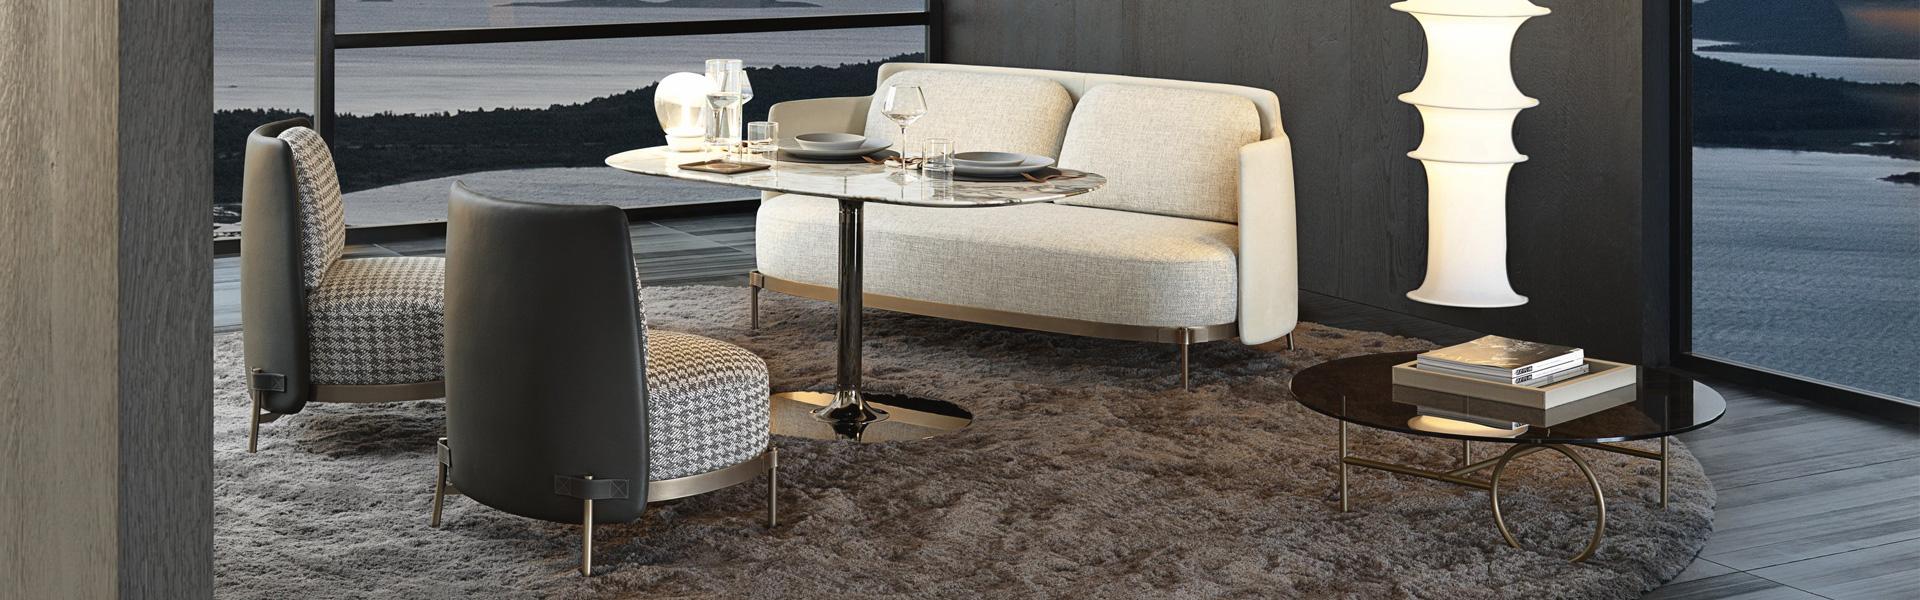 Metal Frame Dining Table Furniture